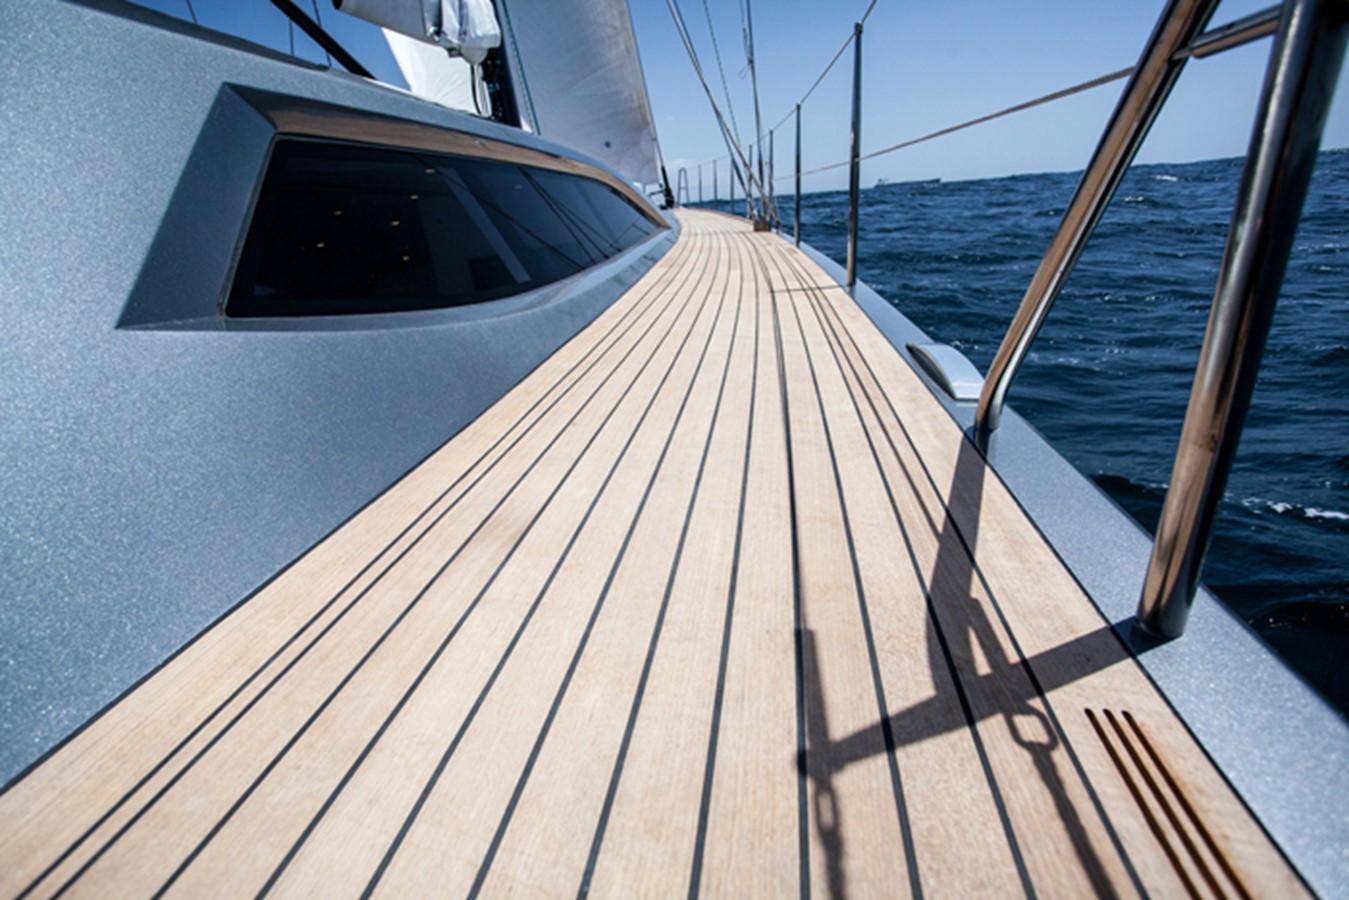 SIDE DECK 1996 GOETZ CUSTOM BOATS/DERECKTOR SHIPYARDS Sparkman & Stephens Designed Performance Sailing Yacht Cruising Sailboat 2585506